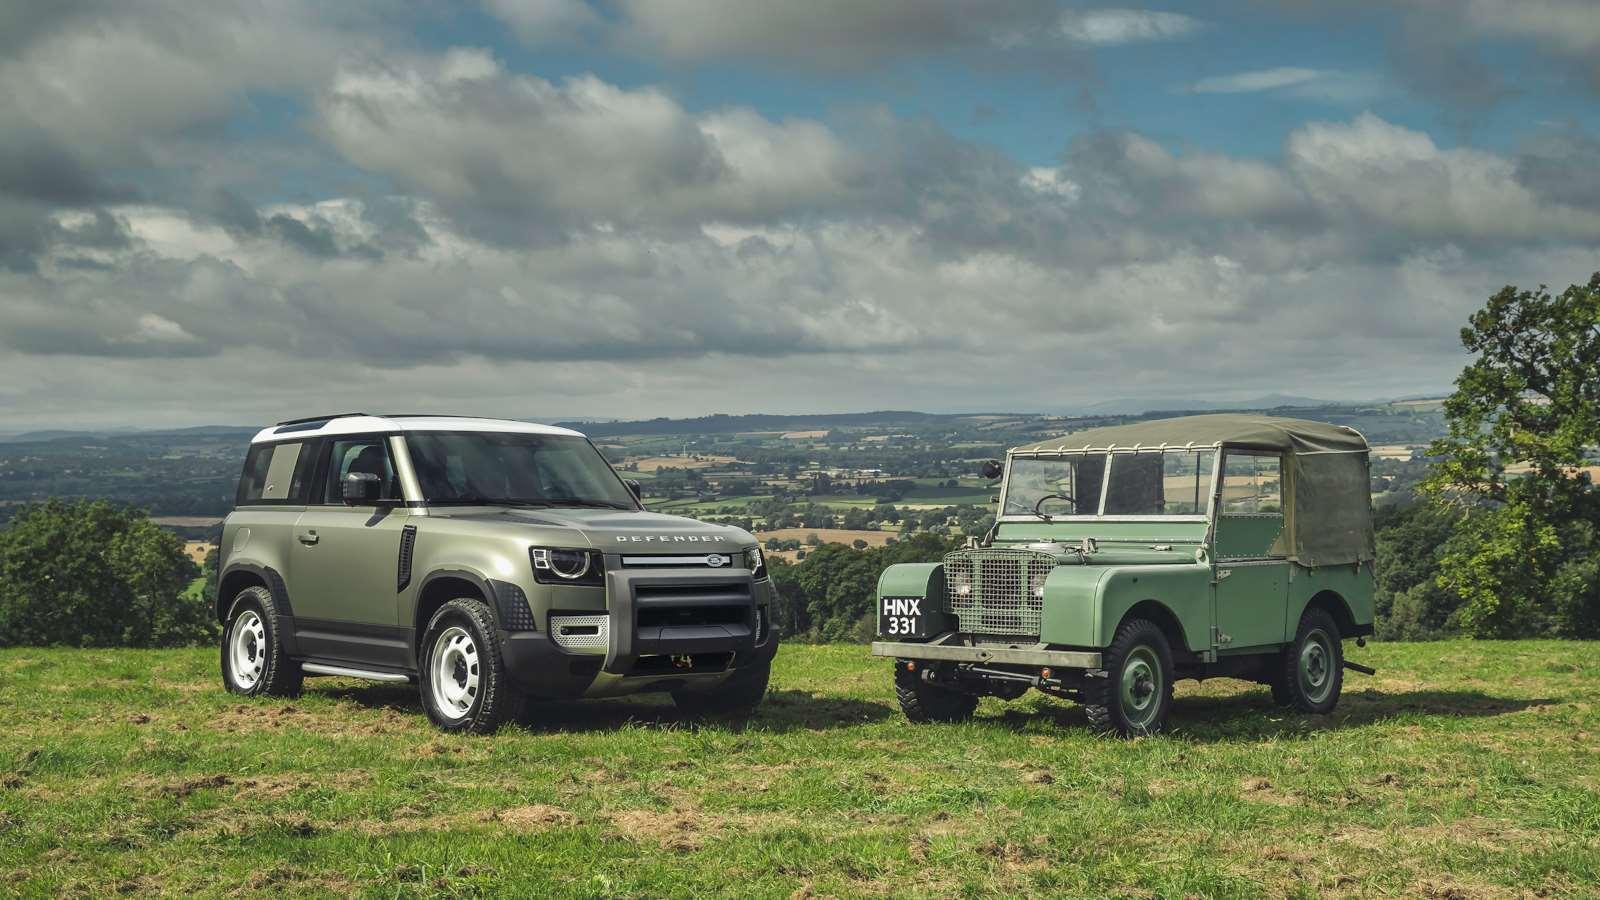 Land Rover Defender випускається з 1948 року